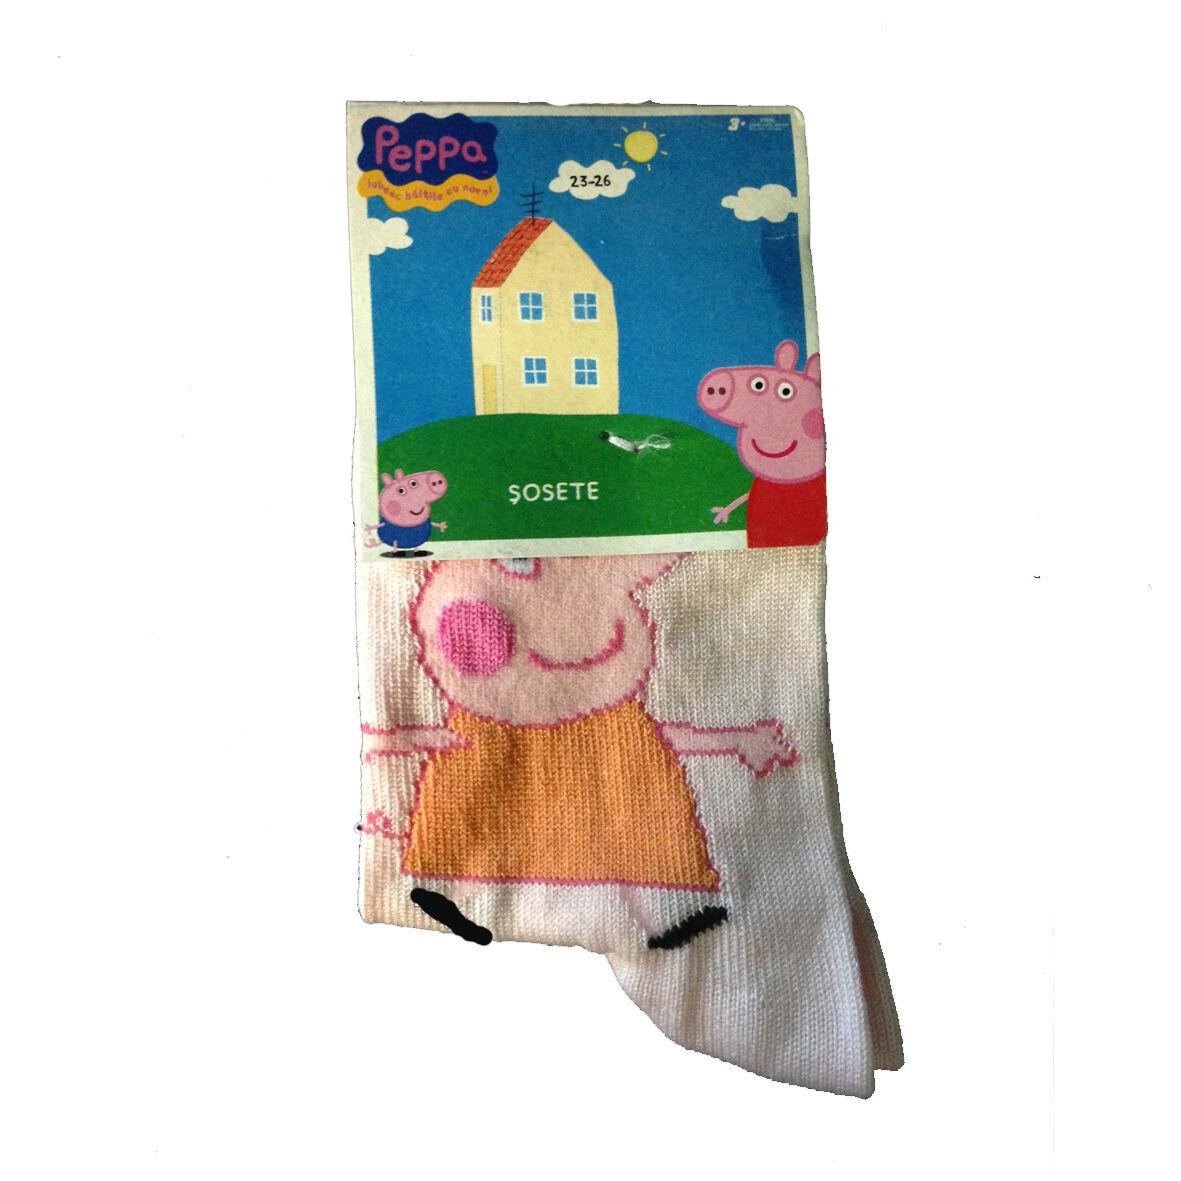 PEPPA PIG Calzini lunghi rosa confetto 80%cotone 15%poliammide 5%elastan da bam